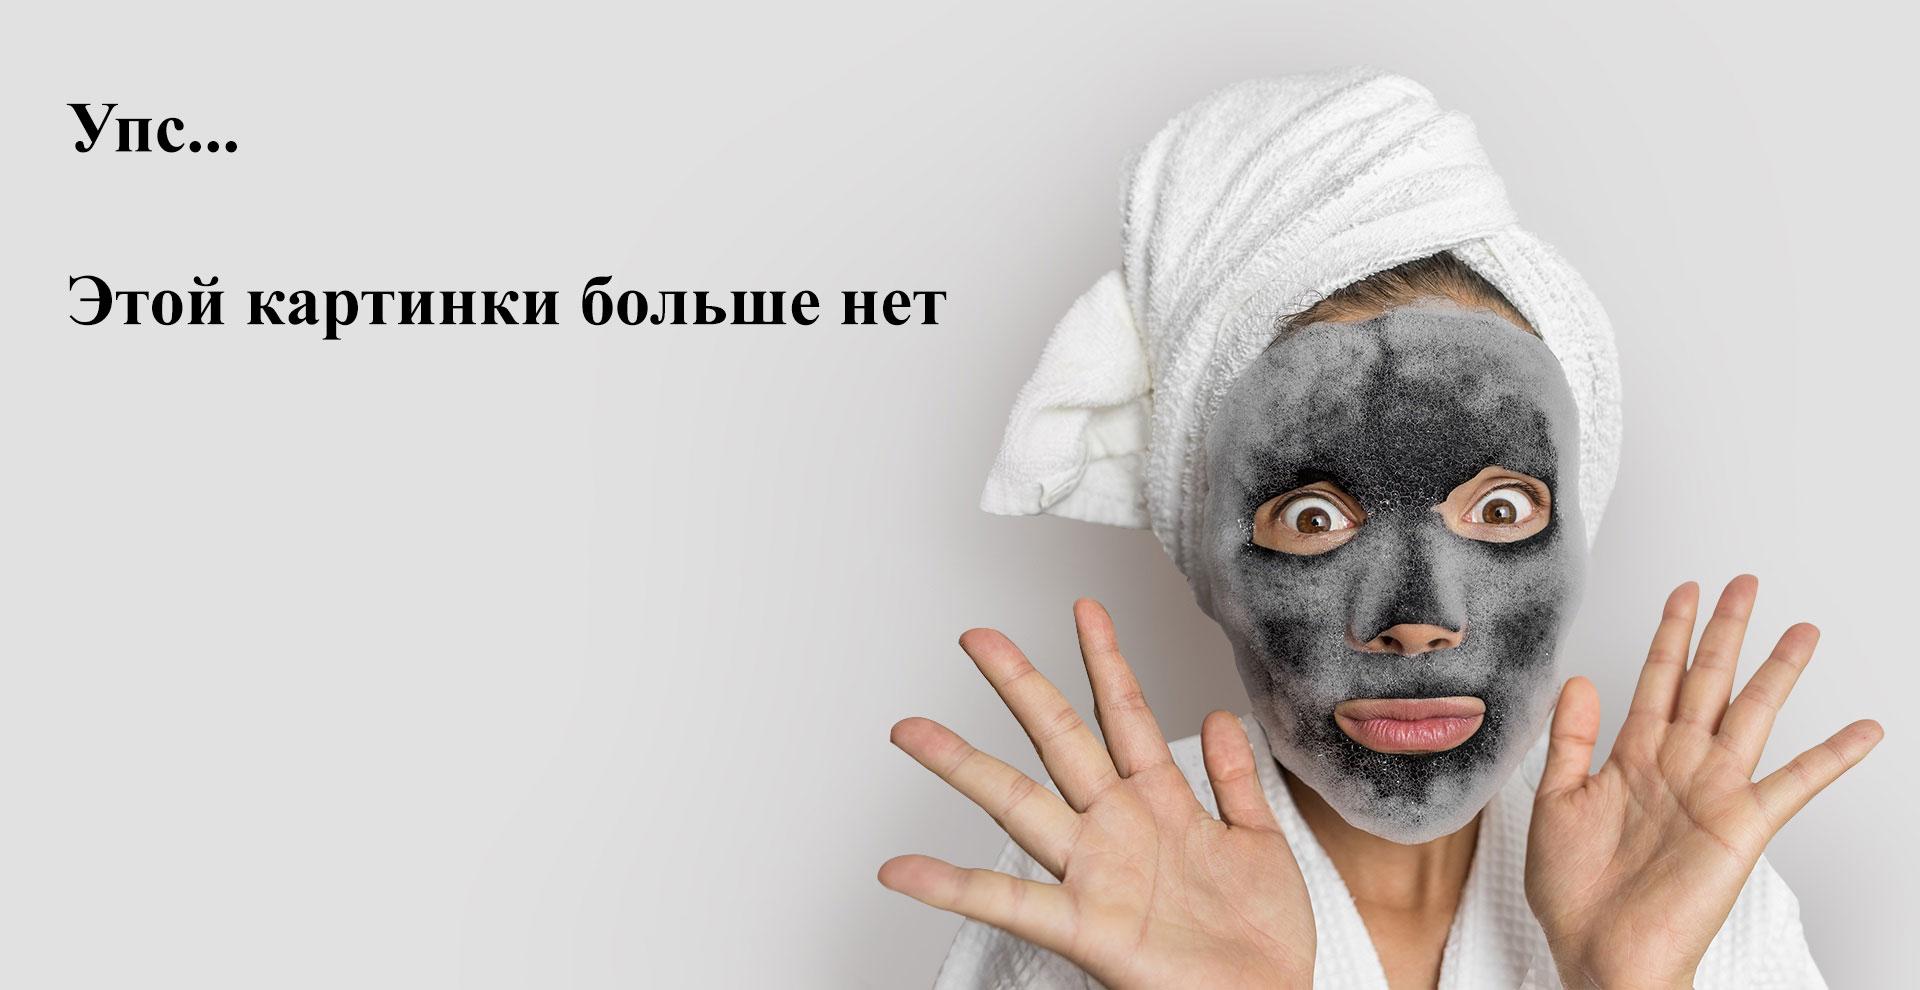 Siberina, Зубная паста «Ромашка», 50 мл